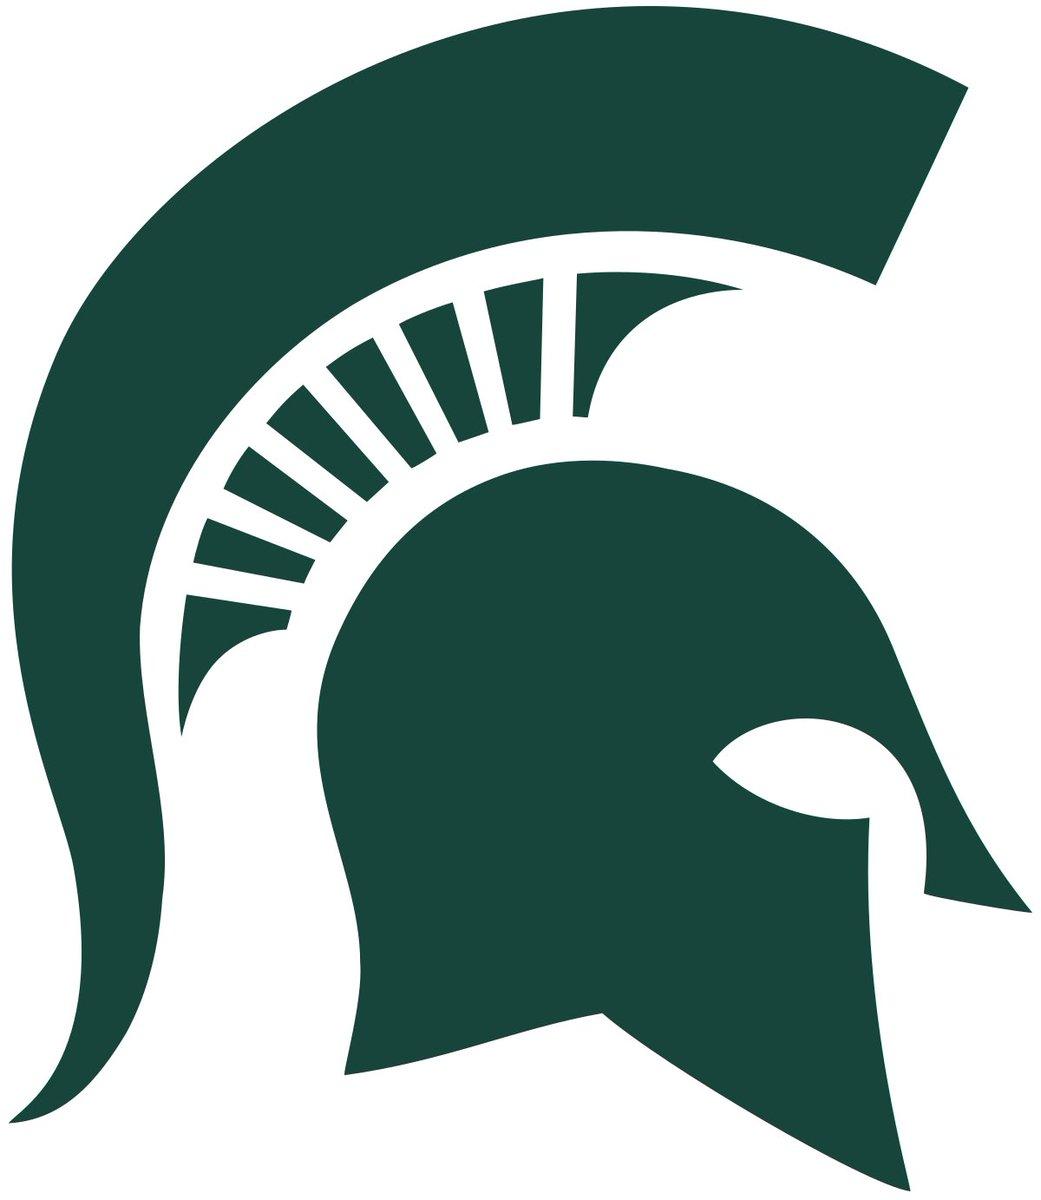 Blessed to receive an offer from Michigan State 💚 @MSU_Football @BigFaceSportss @RecruitGeorgia @ClaxtonRecruits #gammaathletics #GoSpartans🟢